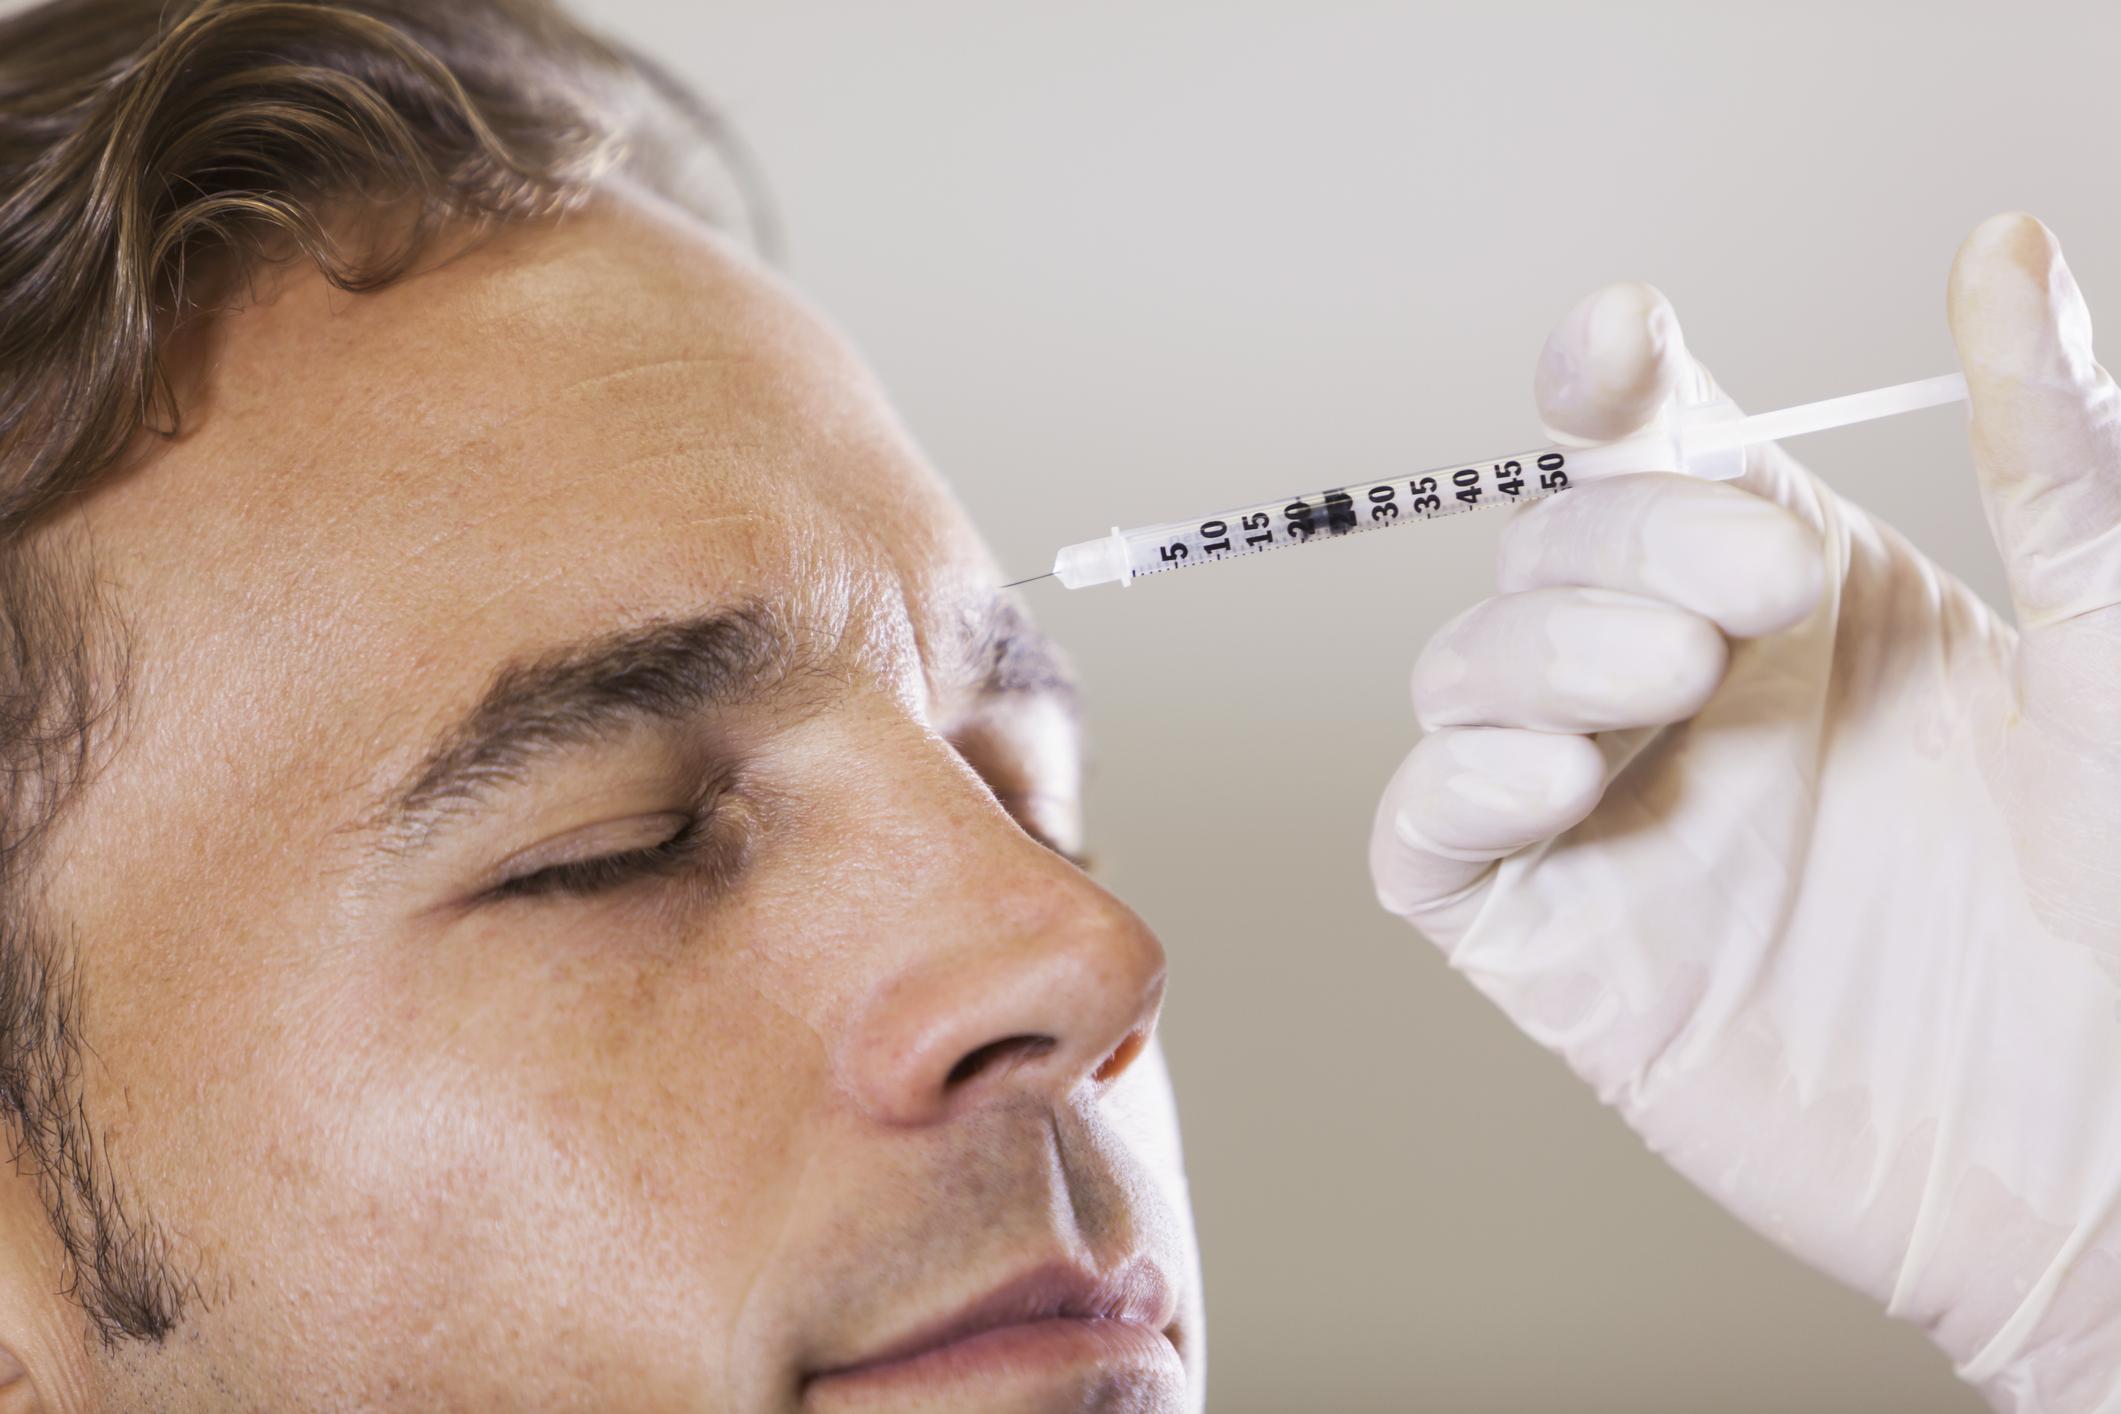 Botox for men in Lexington, MA